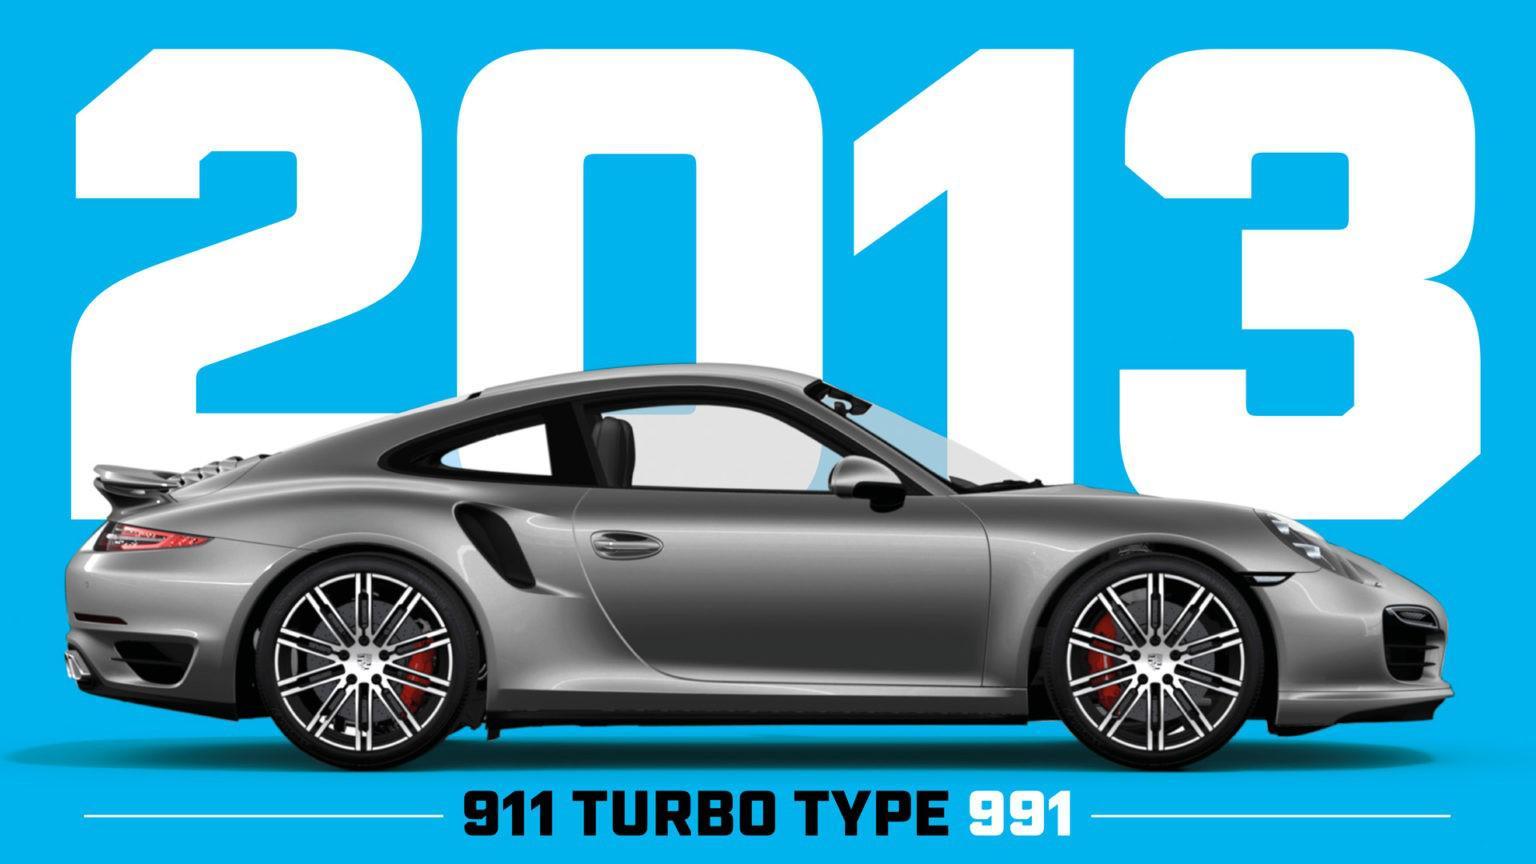 la-saga-porsche-911-turbo-le-guide-d-achat-1349-6.jpg